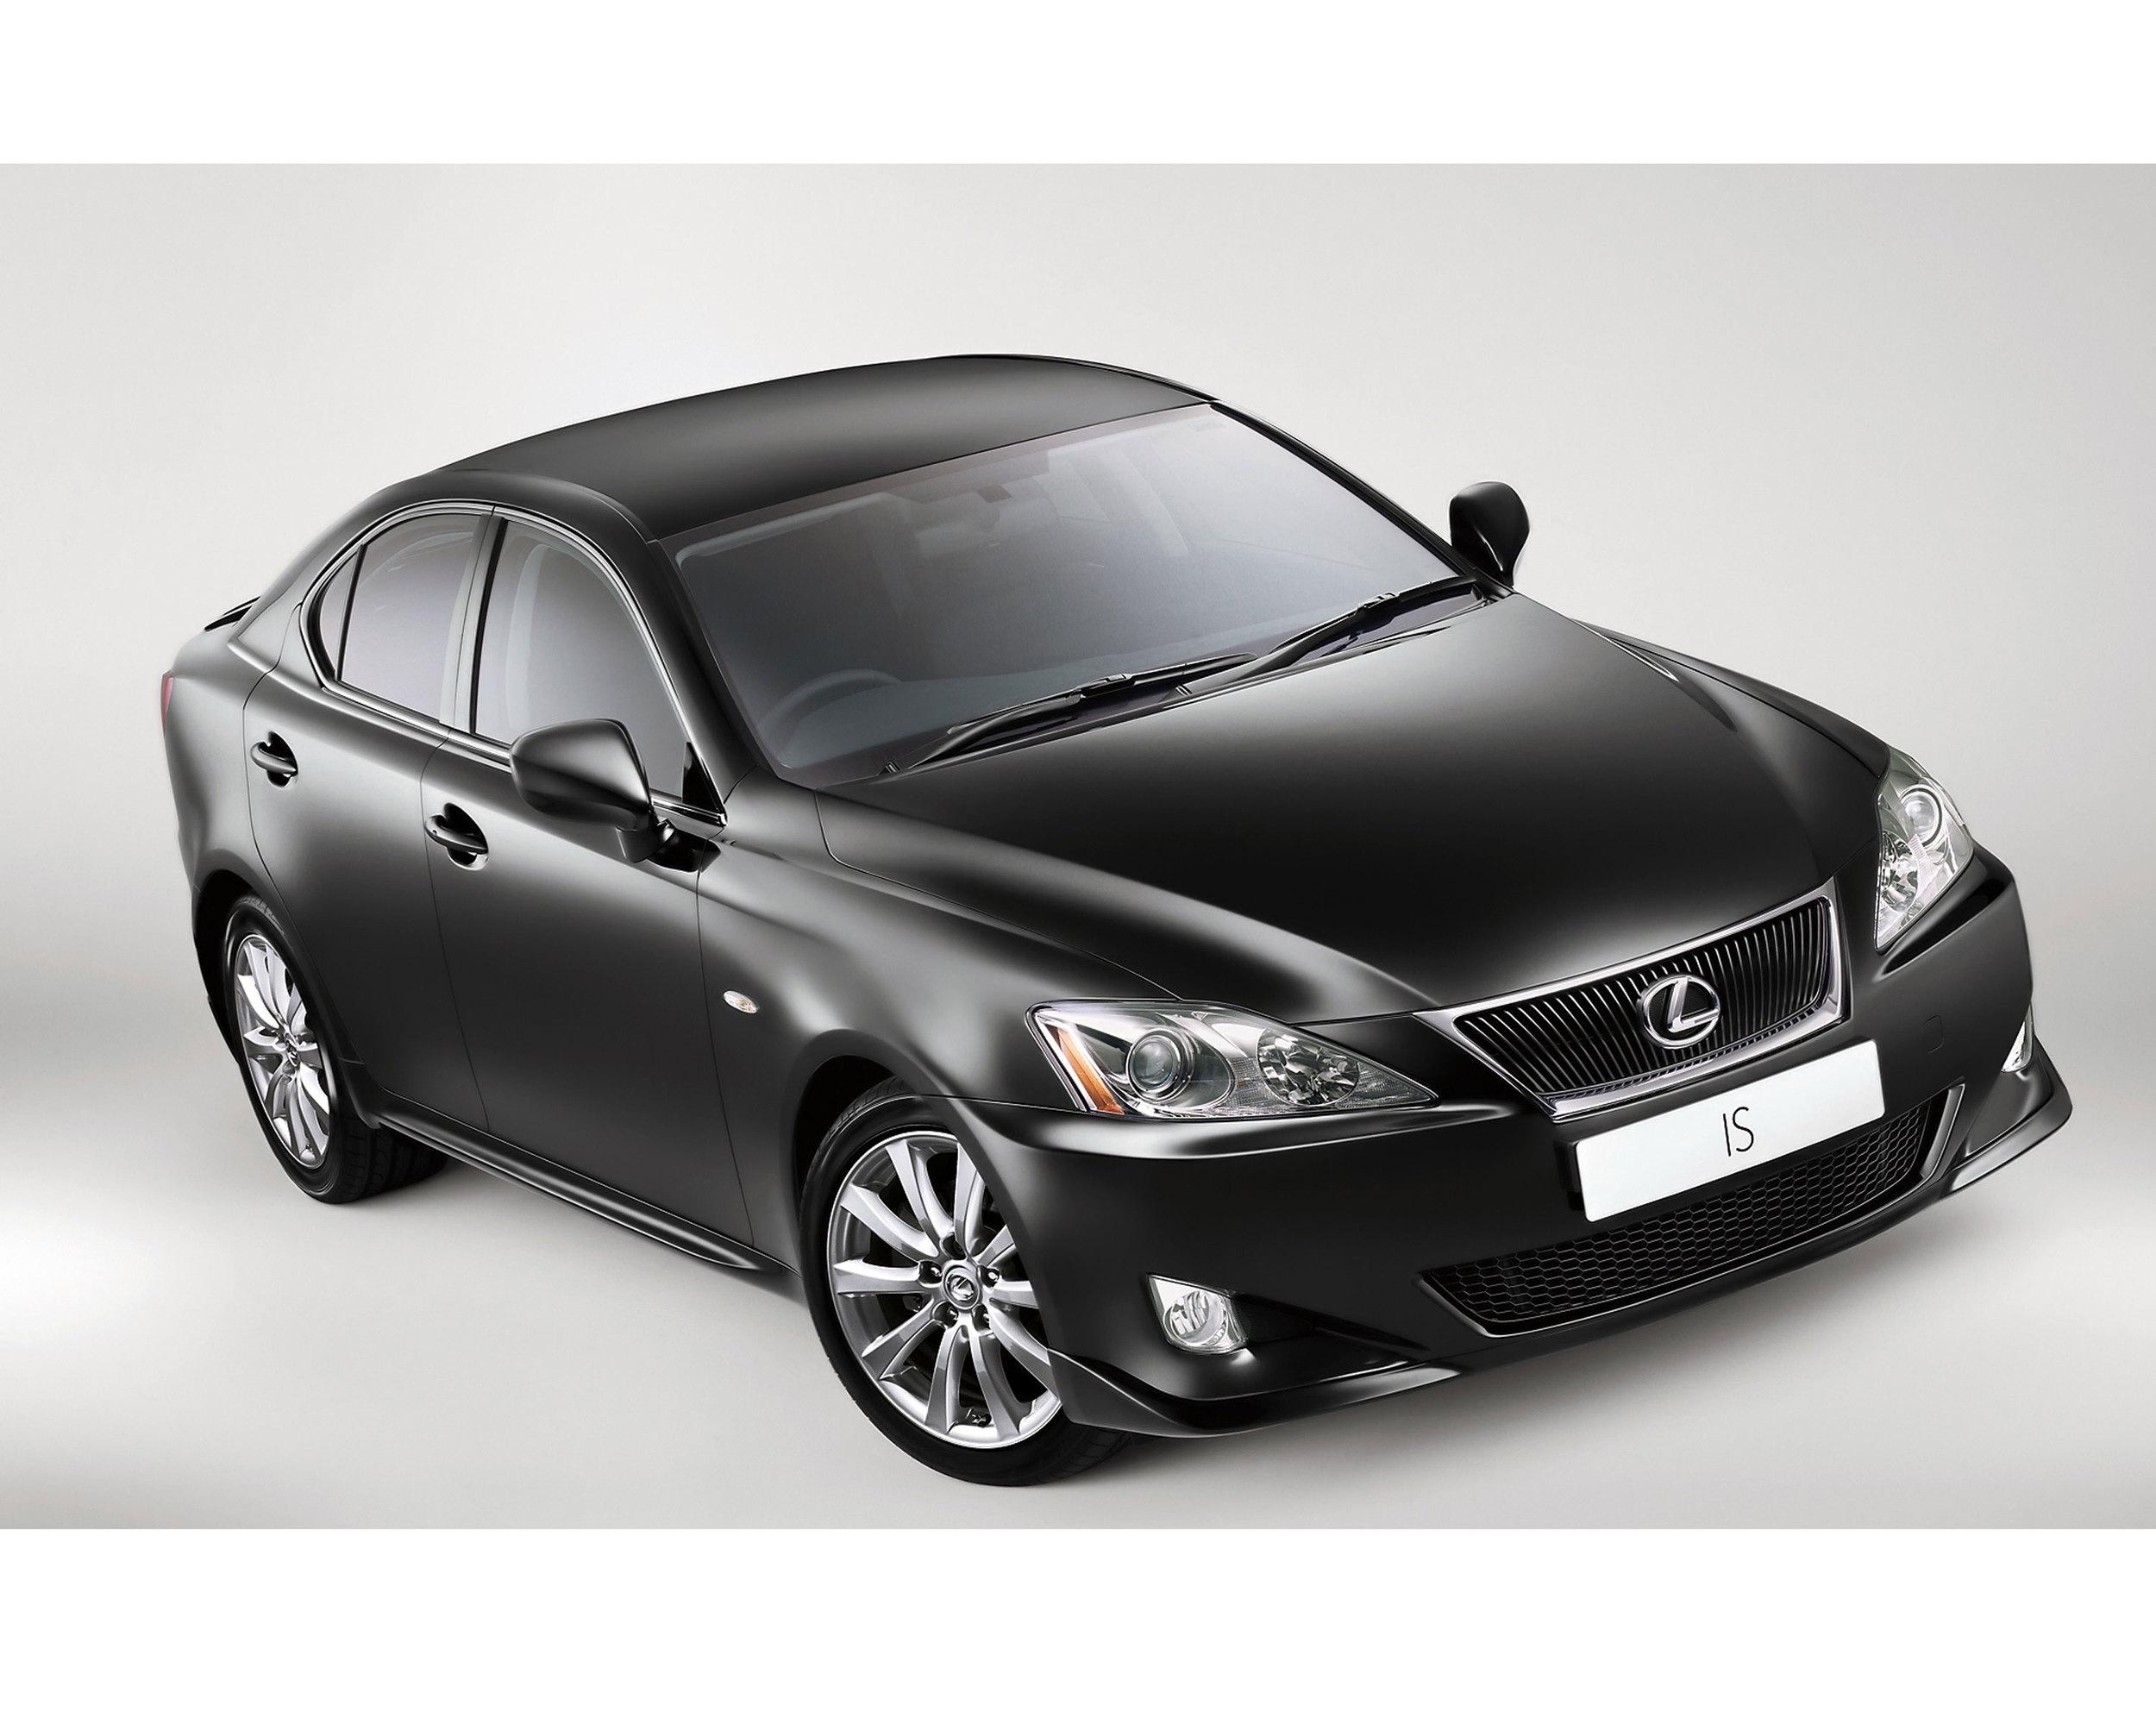 Lexus IS Mk2 (2005-2013)